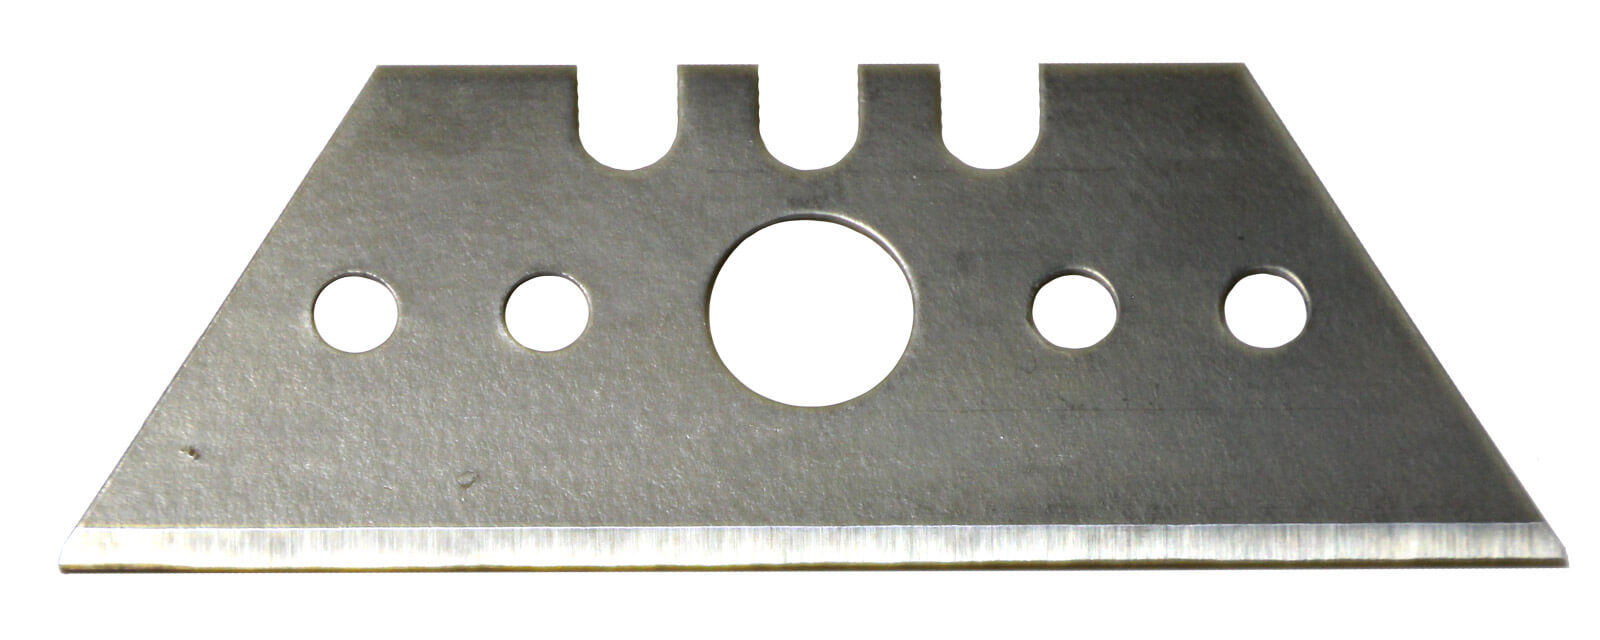 K011-Cuttermesser-Klinge-Trapezklinge-Standard-52-mm-CURT-tools